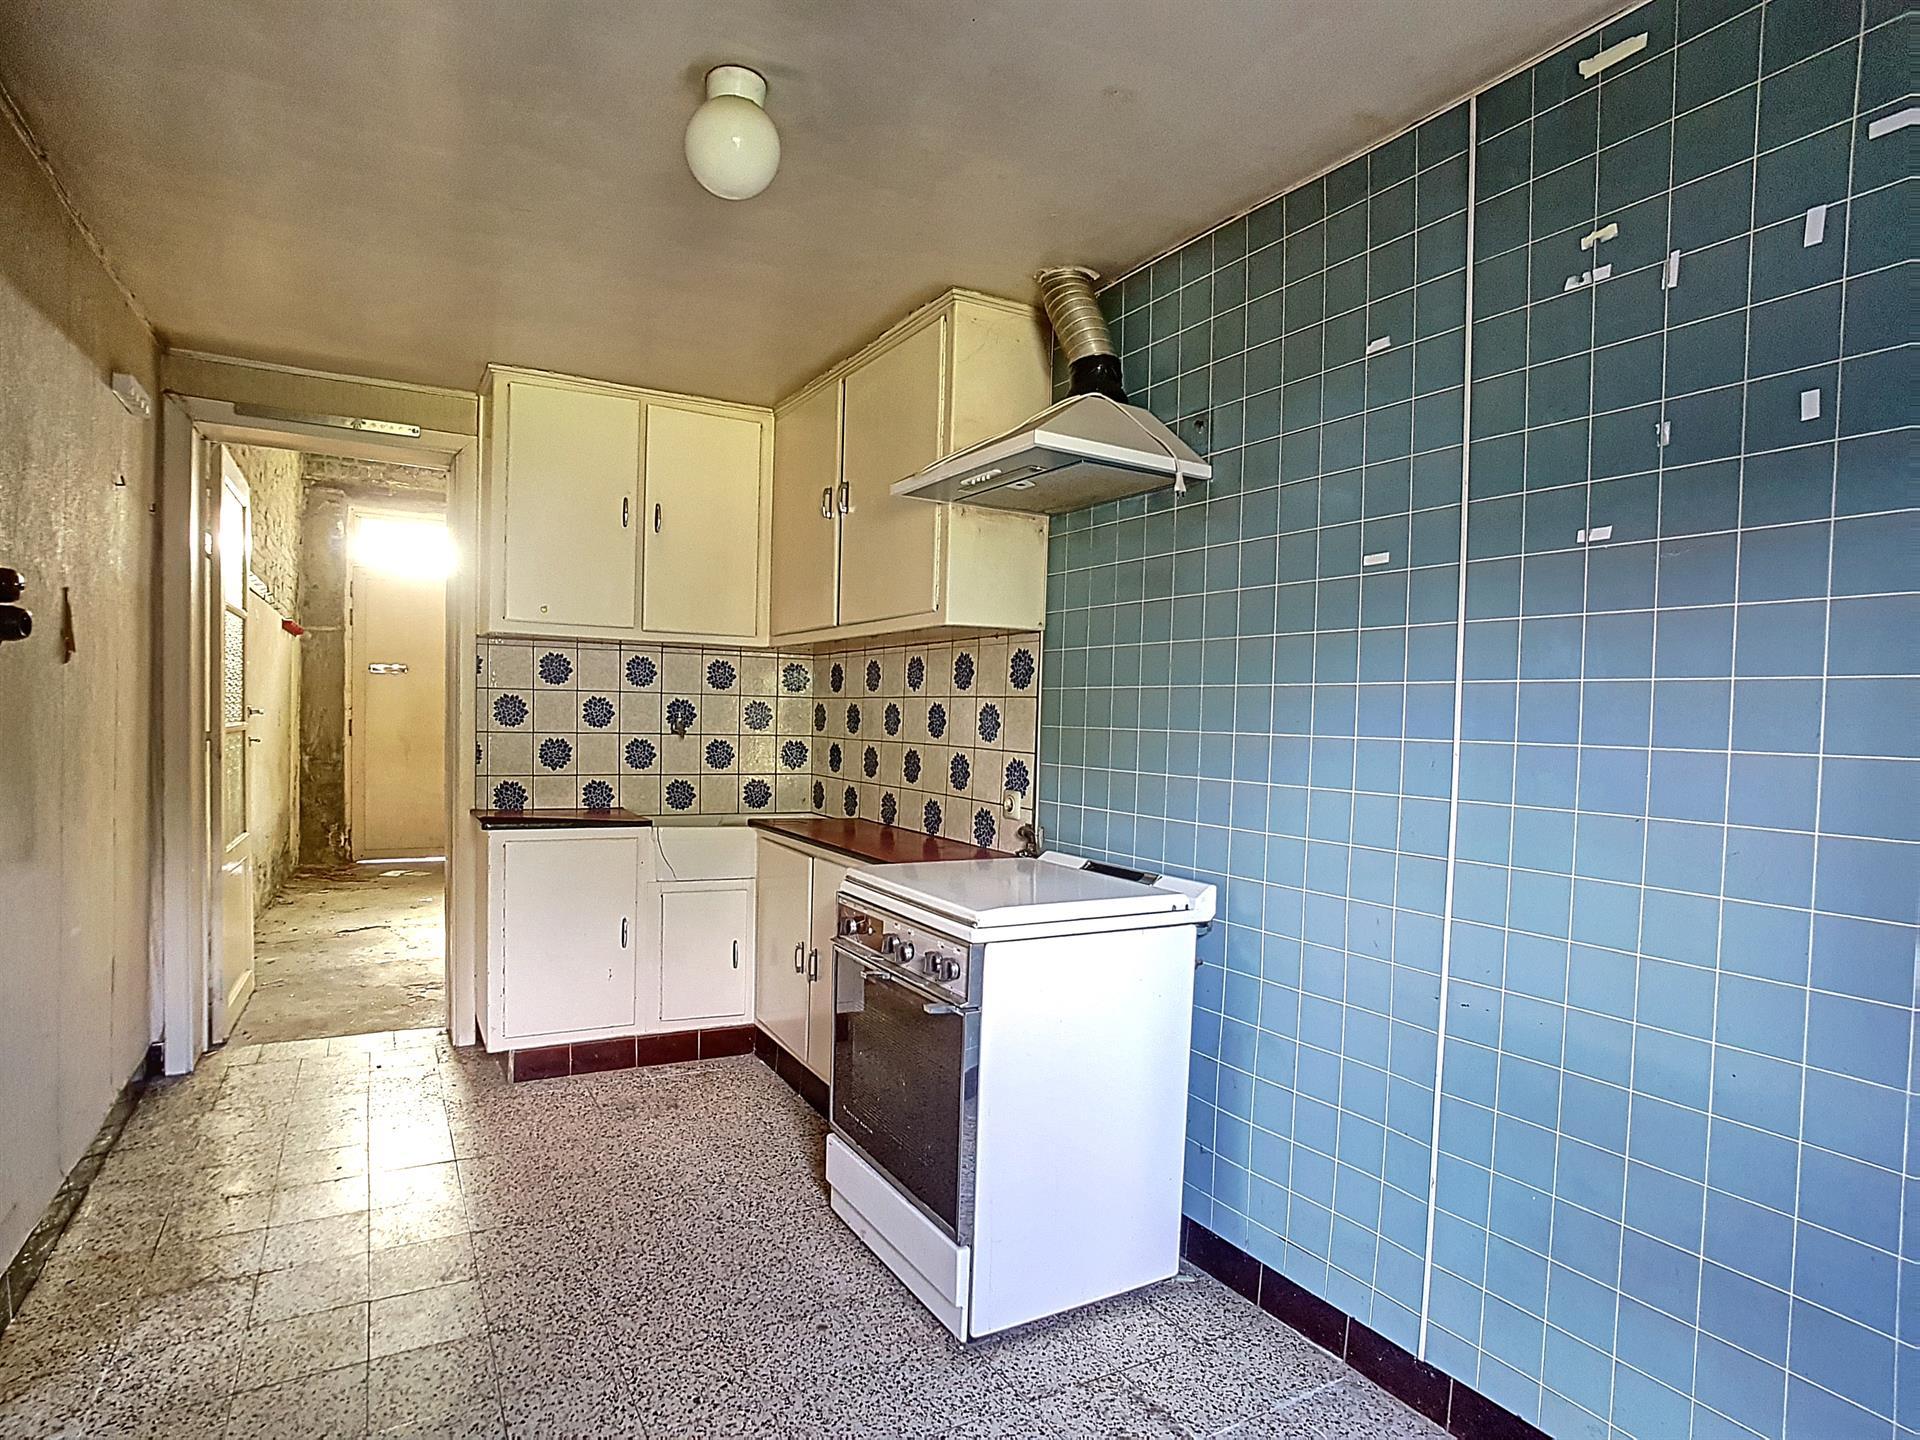 Maison - Zaventem Sterrebeek - #4507431-6